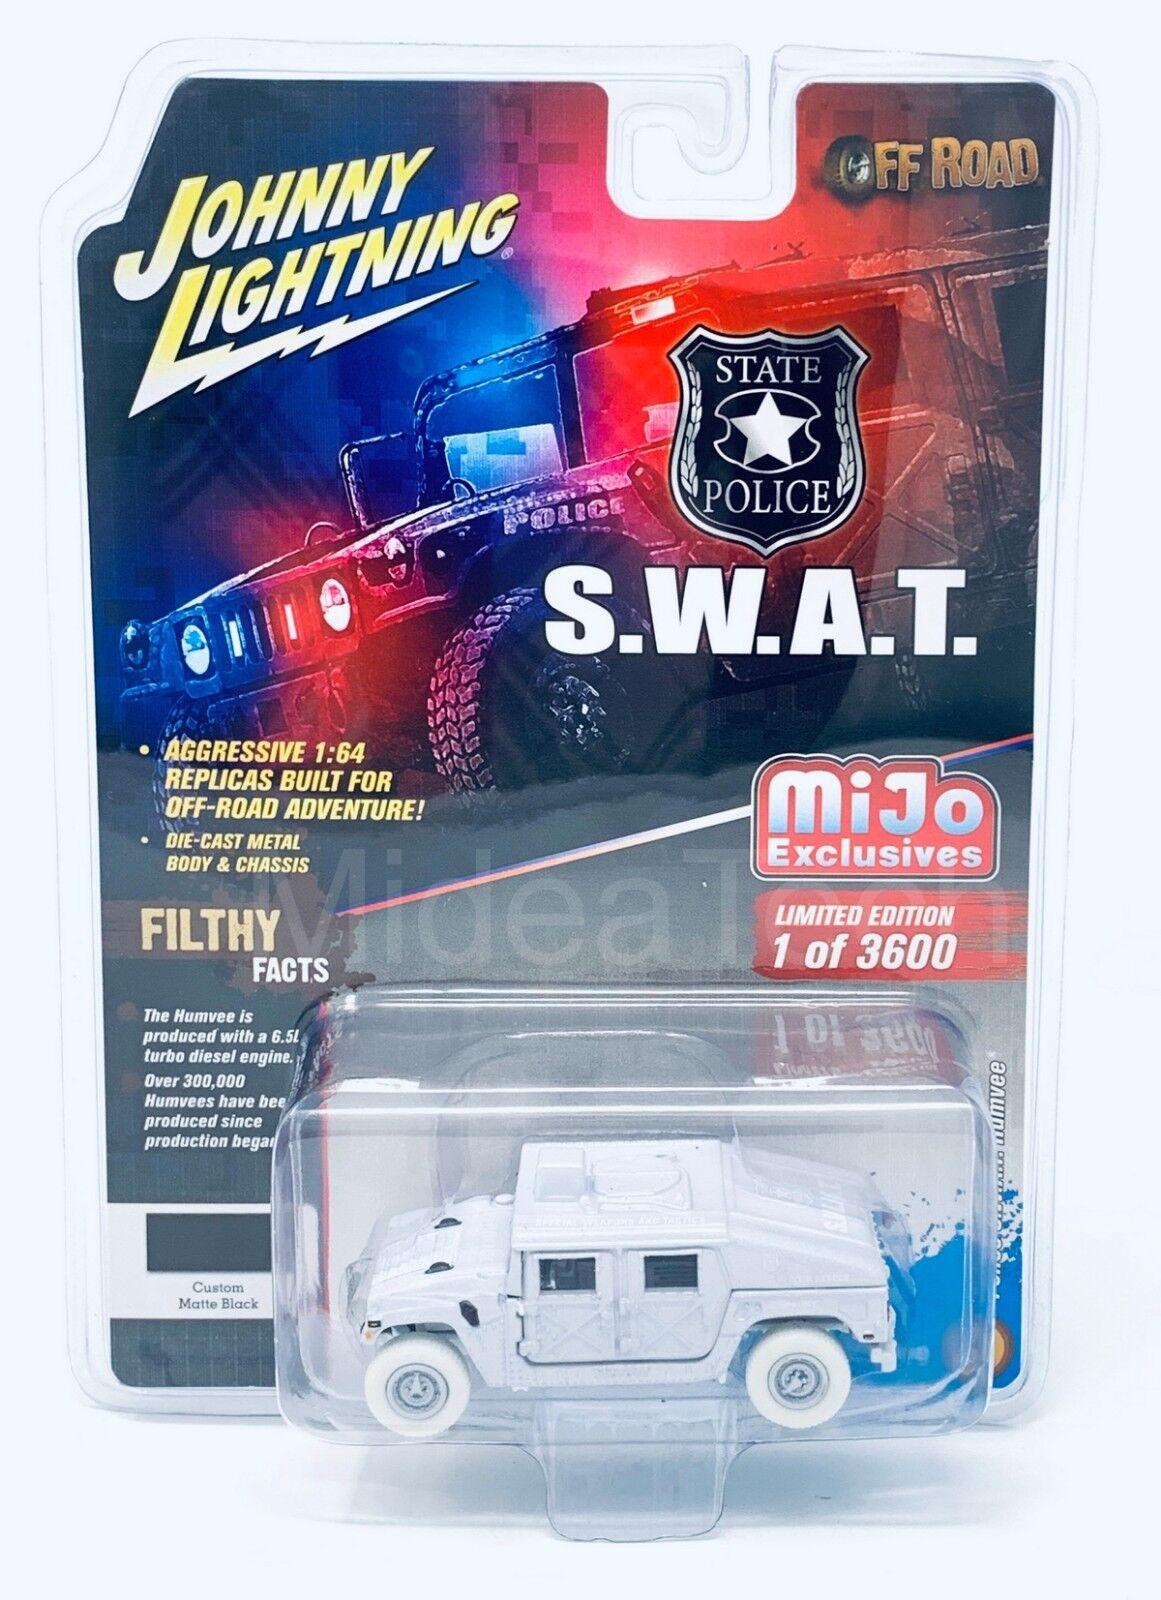 Johnny Lightning 1 64 Police S.W.A.T. Humvee White Lightning Chase Car JLCP7159